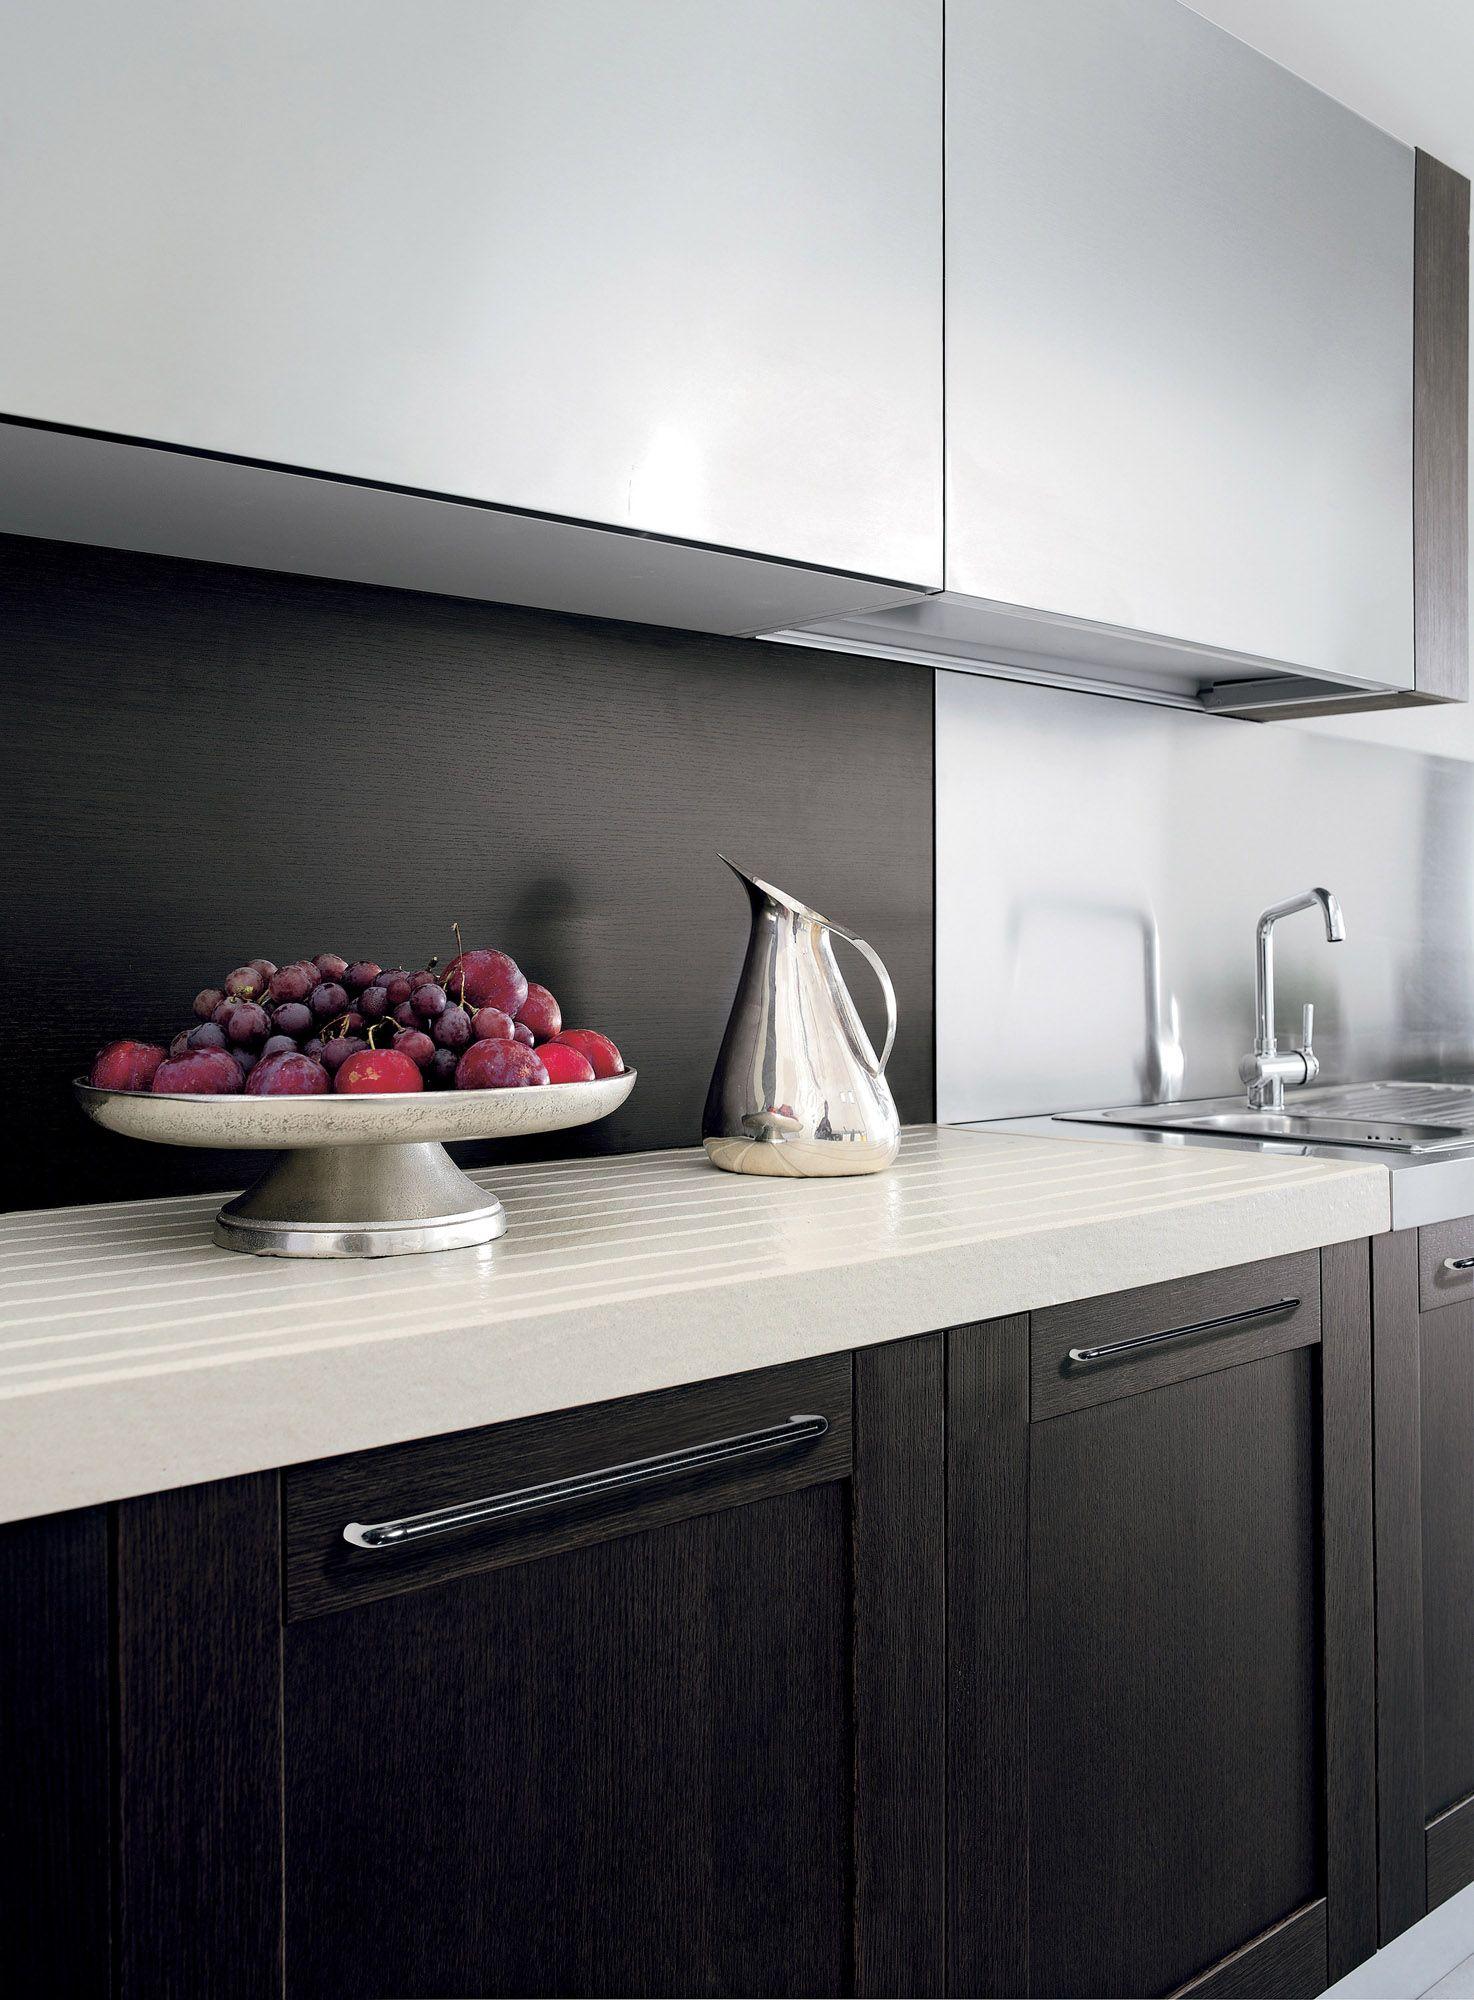 Licia By Aran Cucine European Cabinets Design Studios Italian Kitchen Cabinets Italian Kitchen Contemporary Kitchen Cabinets